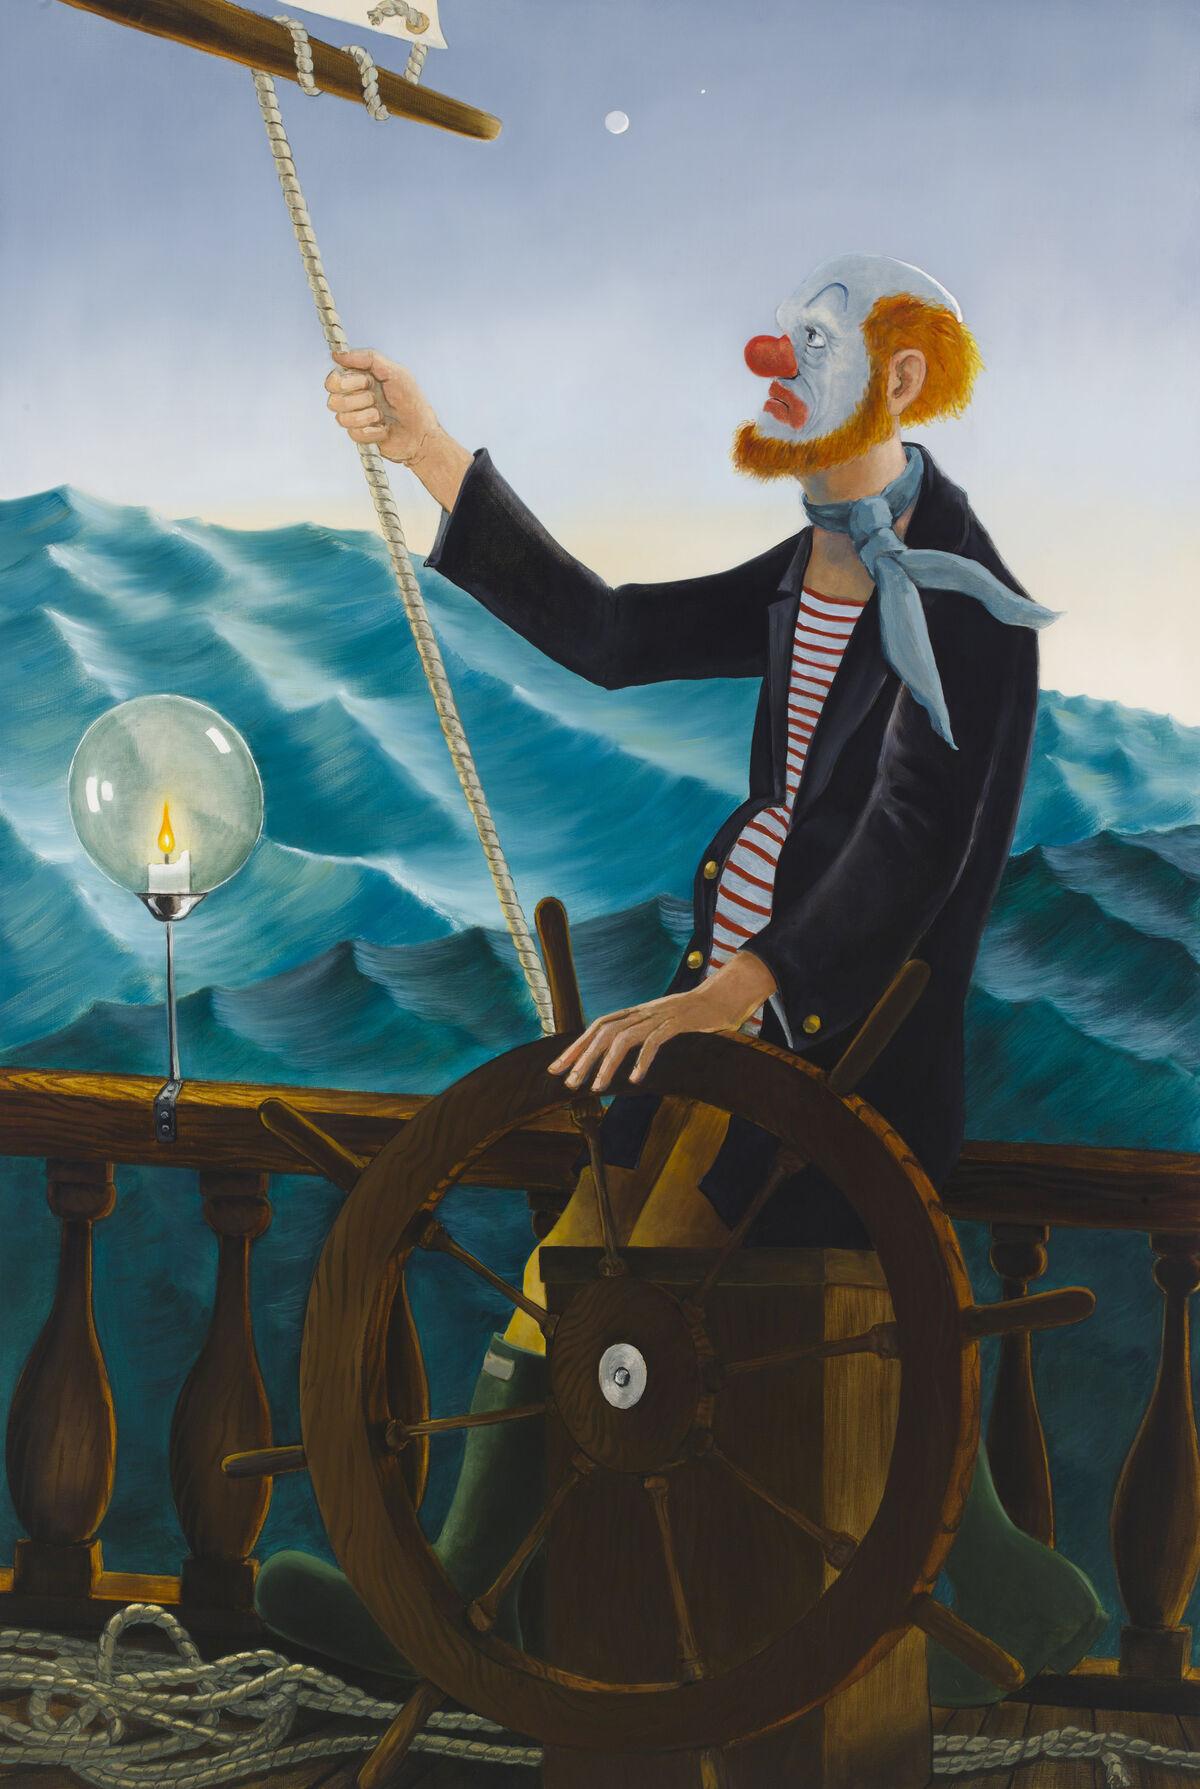 Sean Landers, Around the World Alone (Venerable Seafarer - Dusk), 2011. Courtesy of the artist and Petzel, New York.